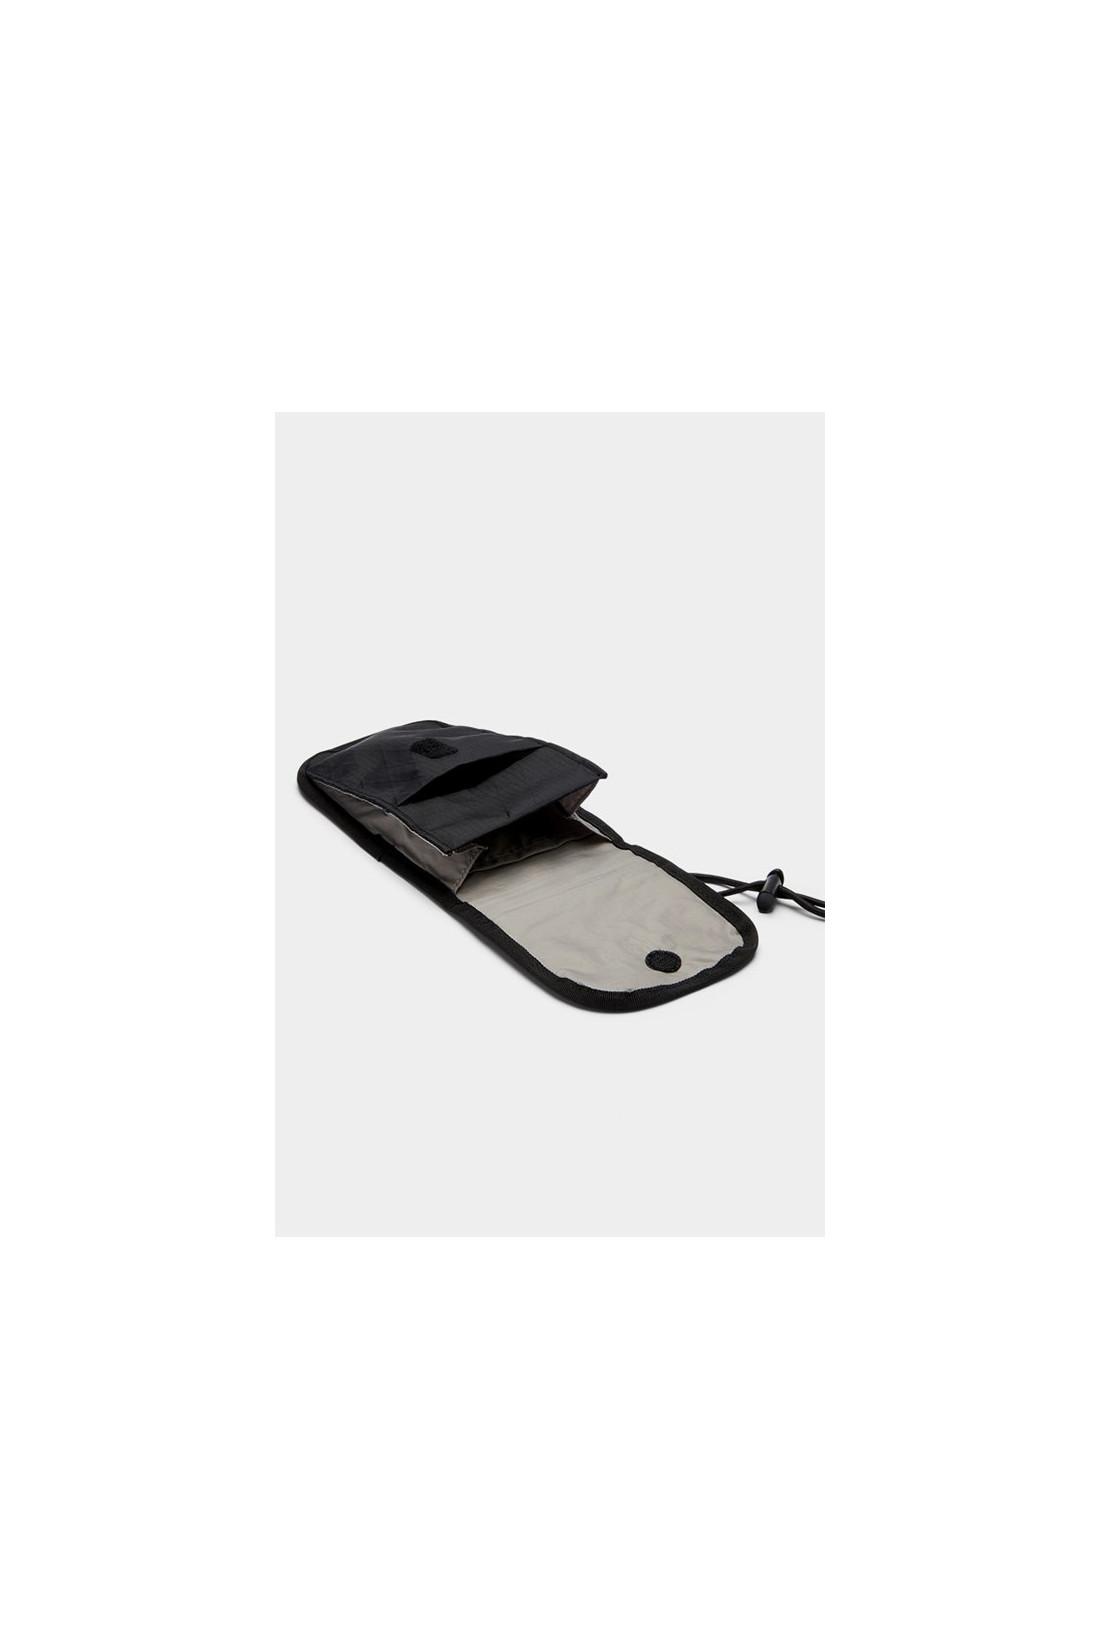 STUSSY / Travel pouch Black